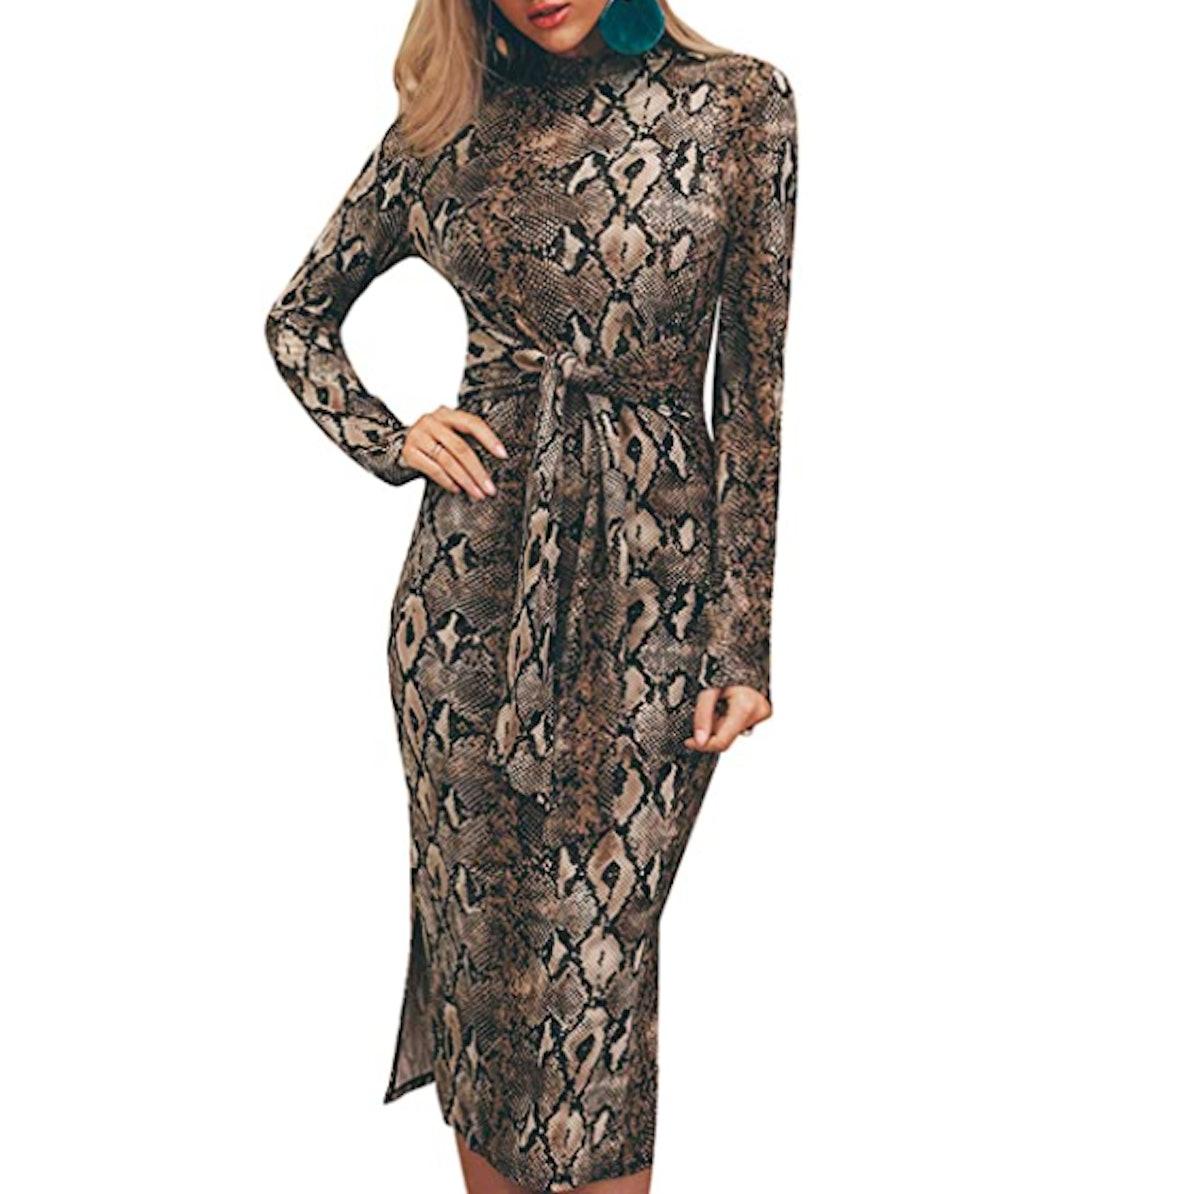 Miessial Women's Long Sleeve Leopard Print Midi Dress Fall Winter Tie Waist Sexy Bodycon Dress